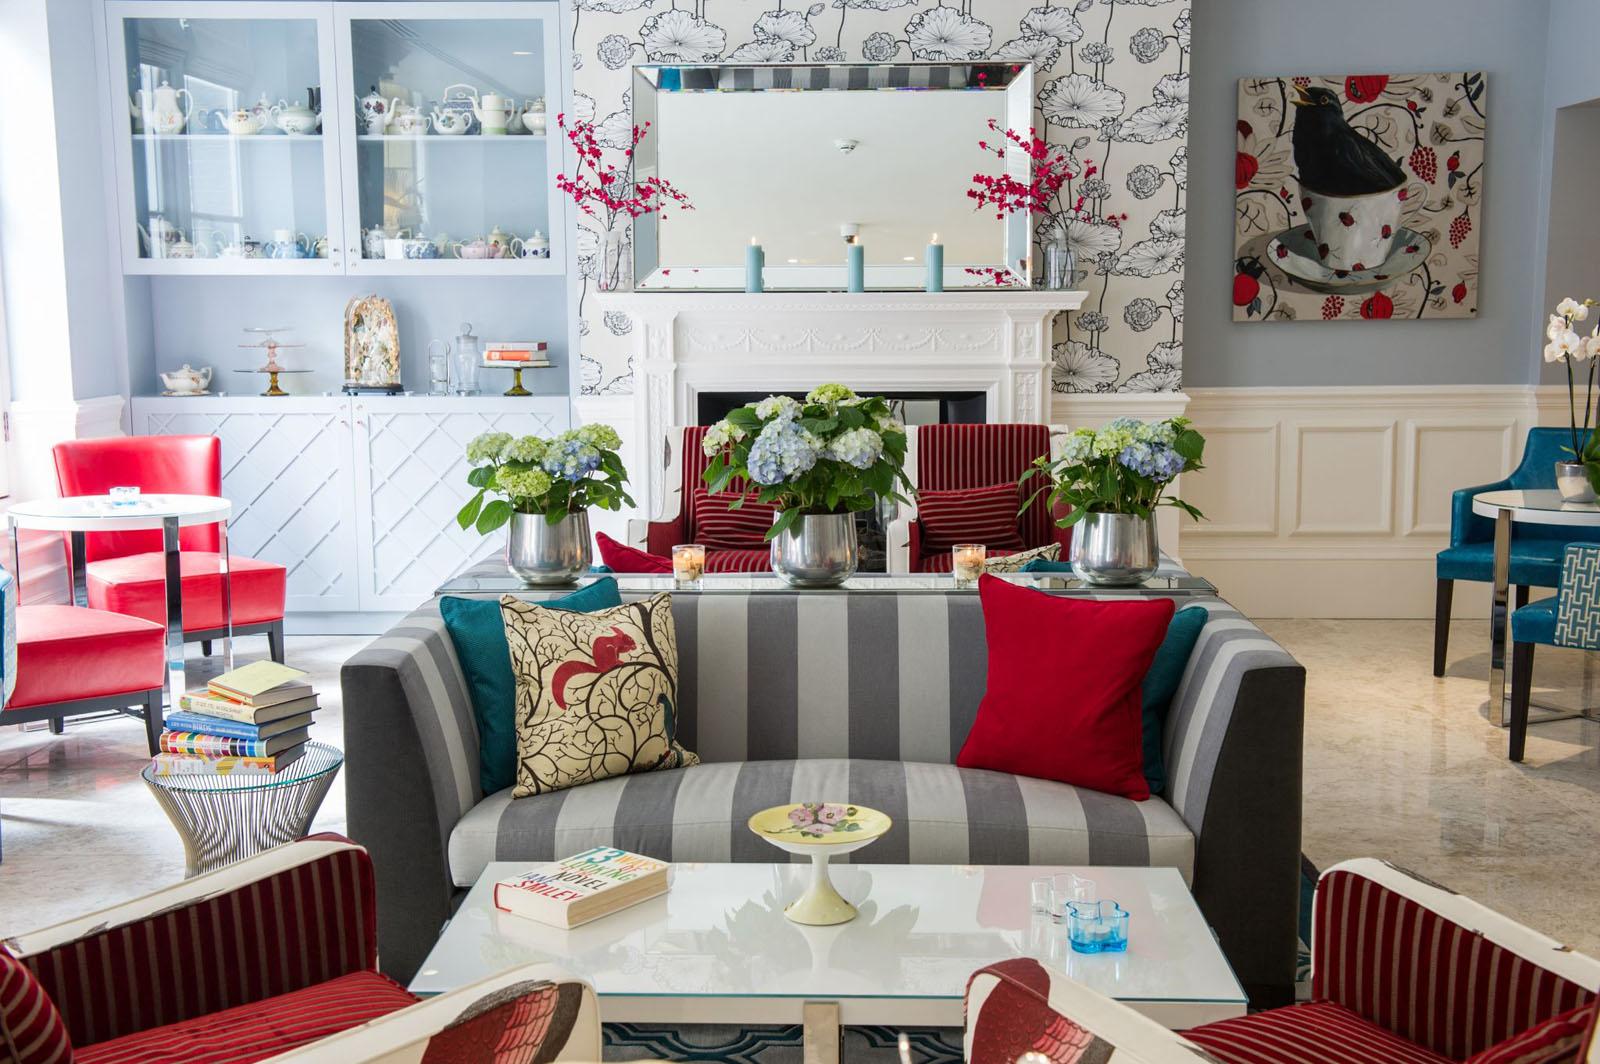 Whimsical-home-decor-design-ideas